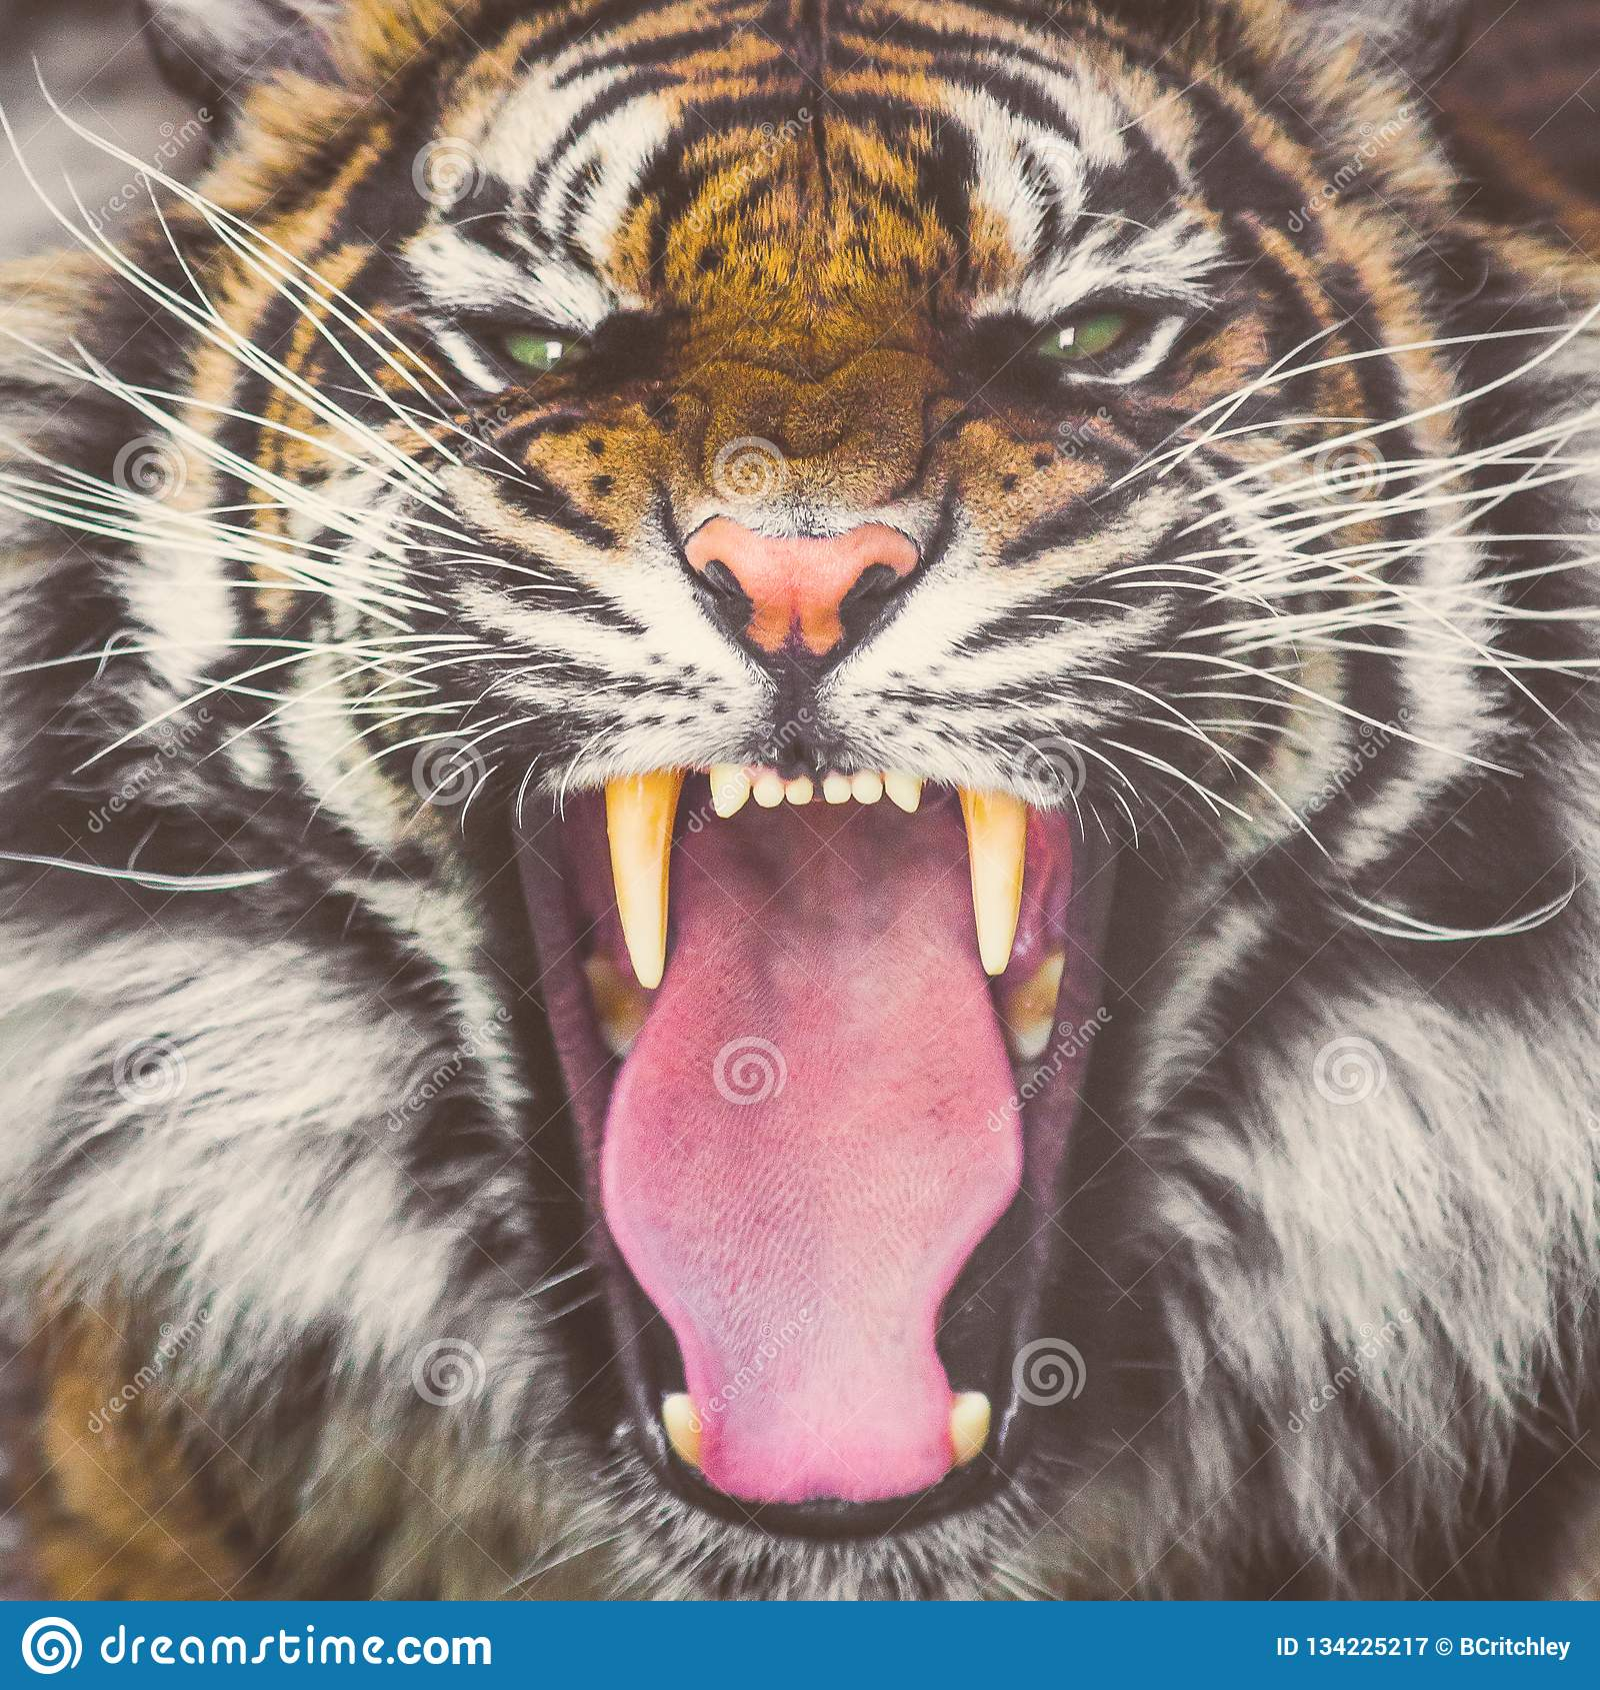 Roaring Sumatran tiger showing teeth